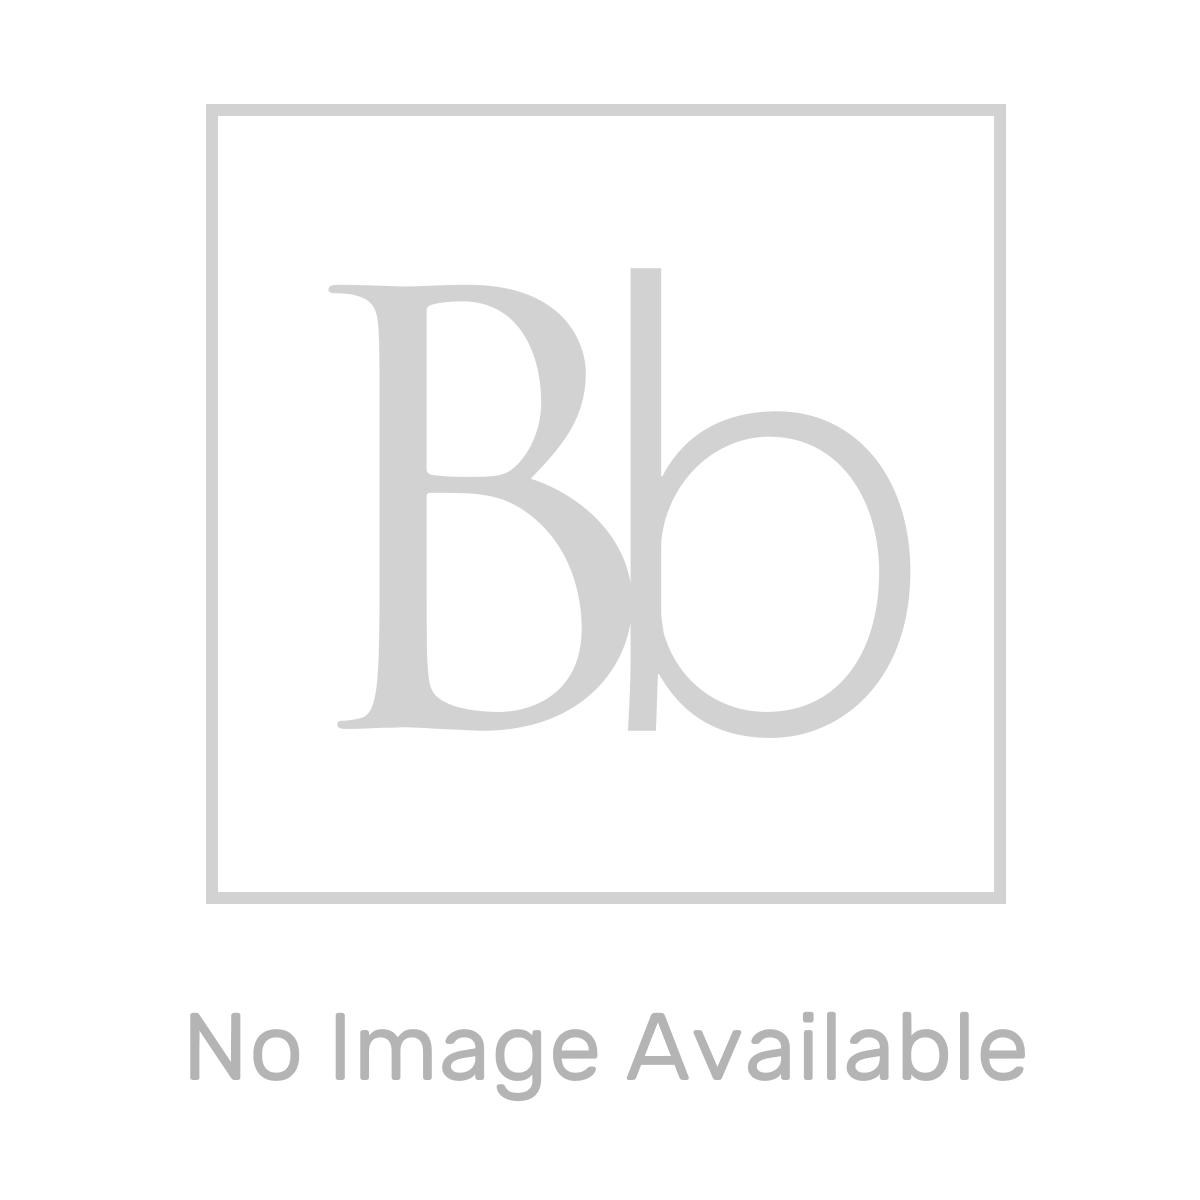 Aquadart Rectangular 1100 x 700 Shower Tray Line Drawing